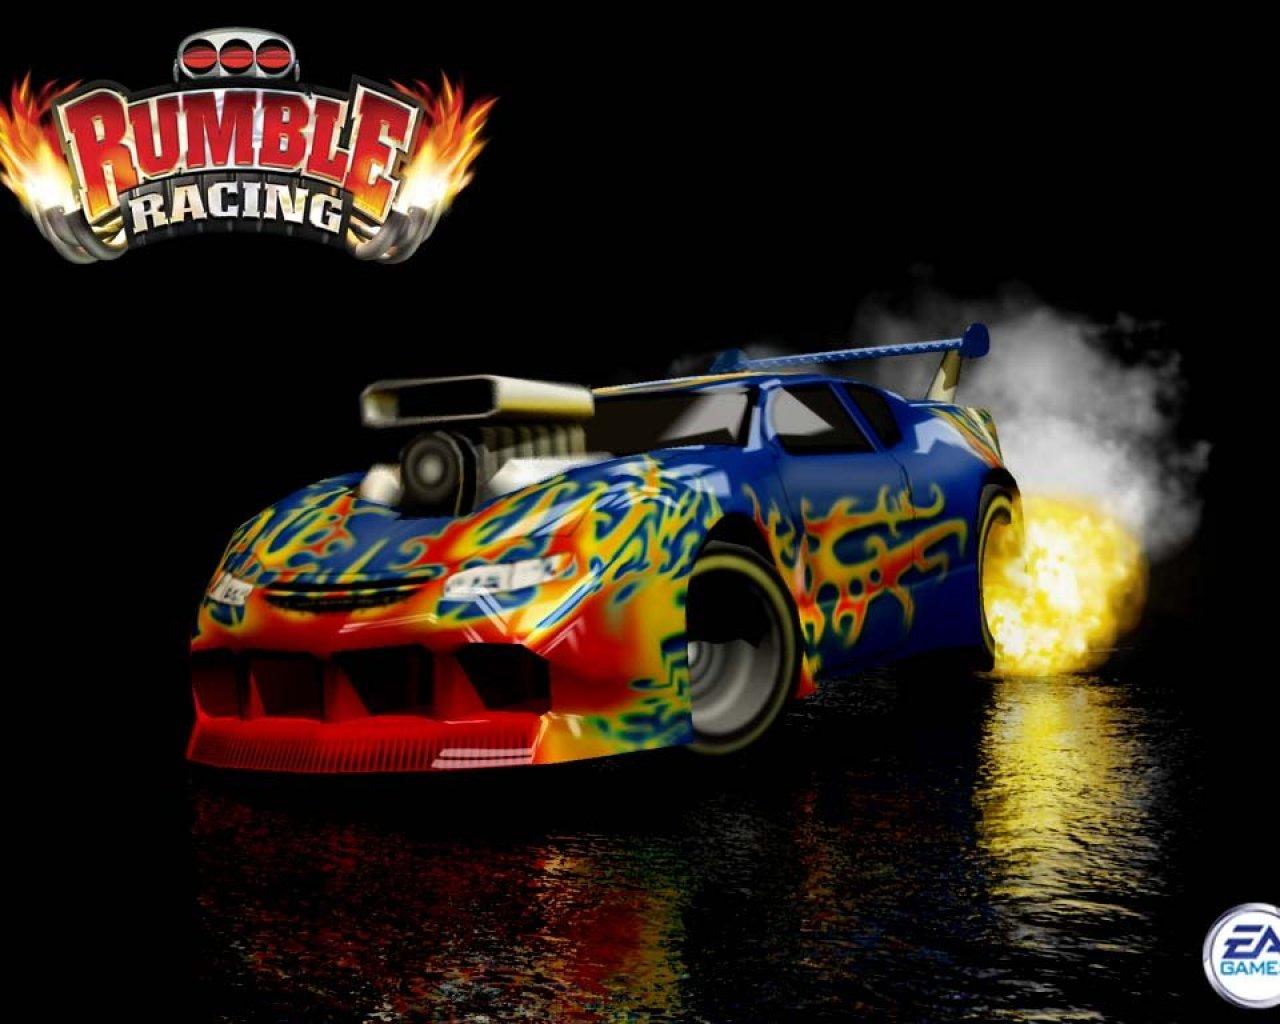 http://downloads.khinsider.com/wallpaper/1280x1024/2731-rumble-racing-002-eerup.jpg